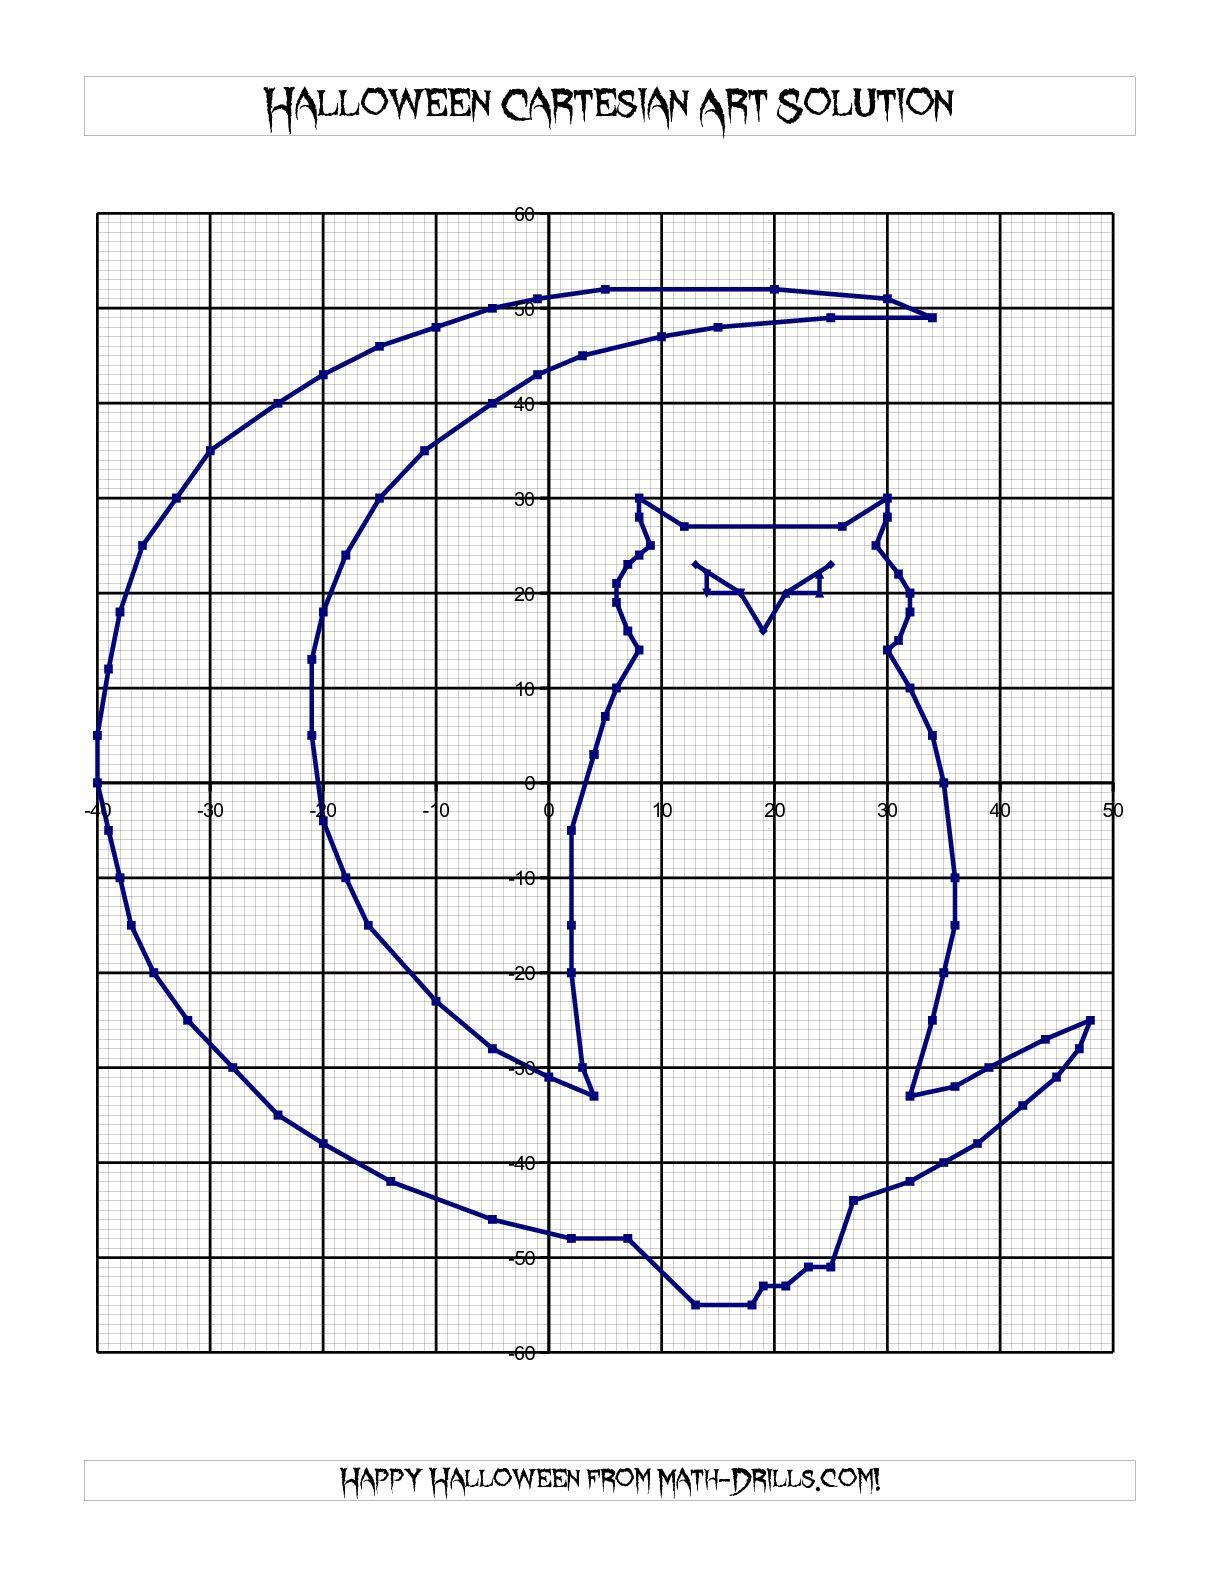 Image Result For Halloween Printable Worksheet